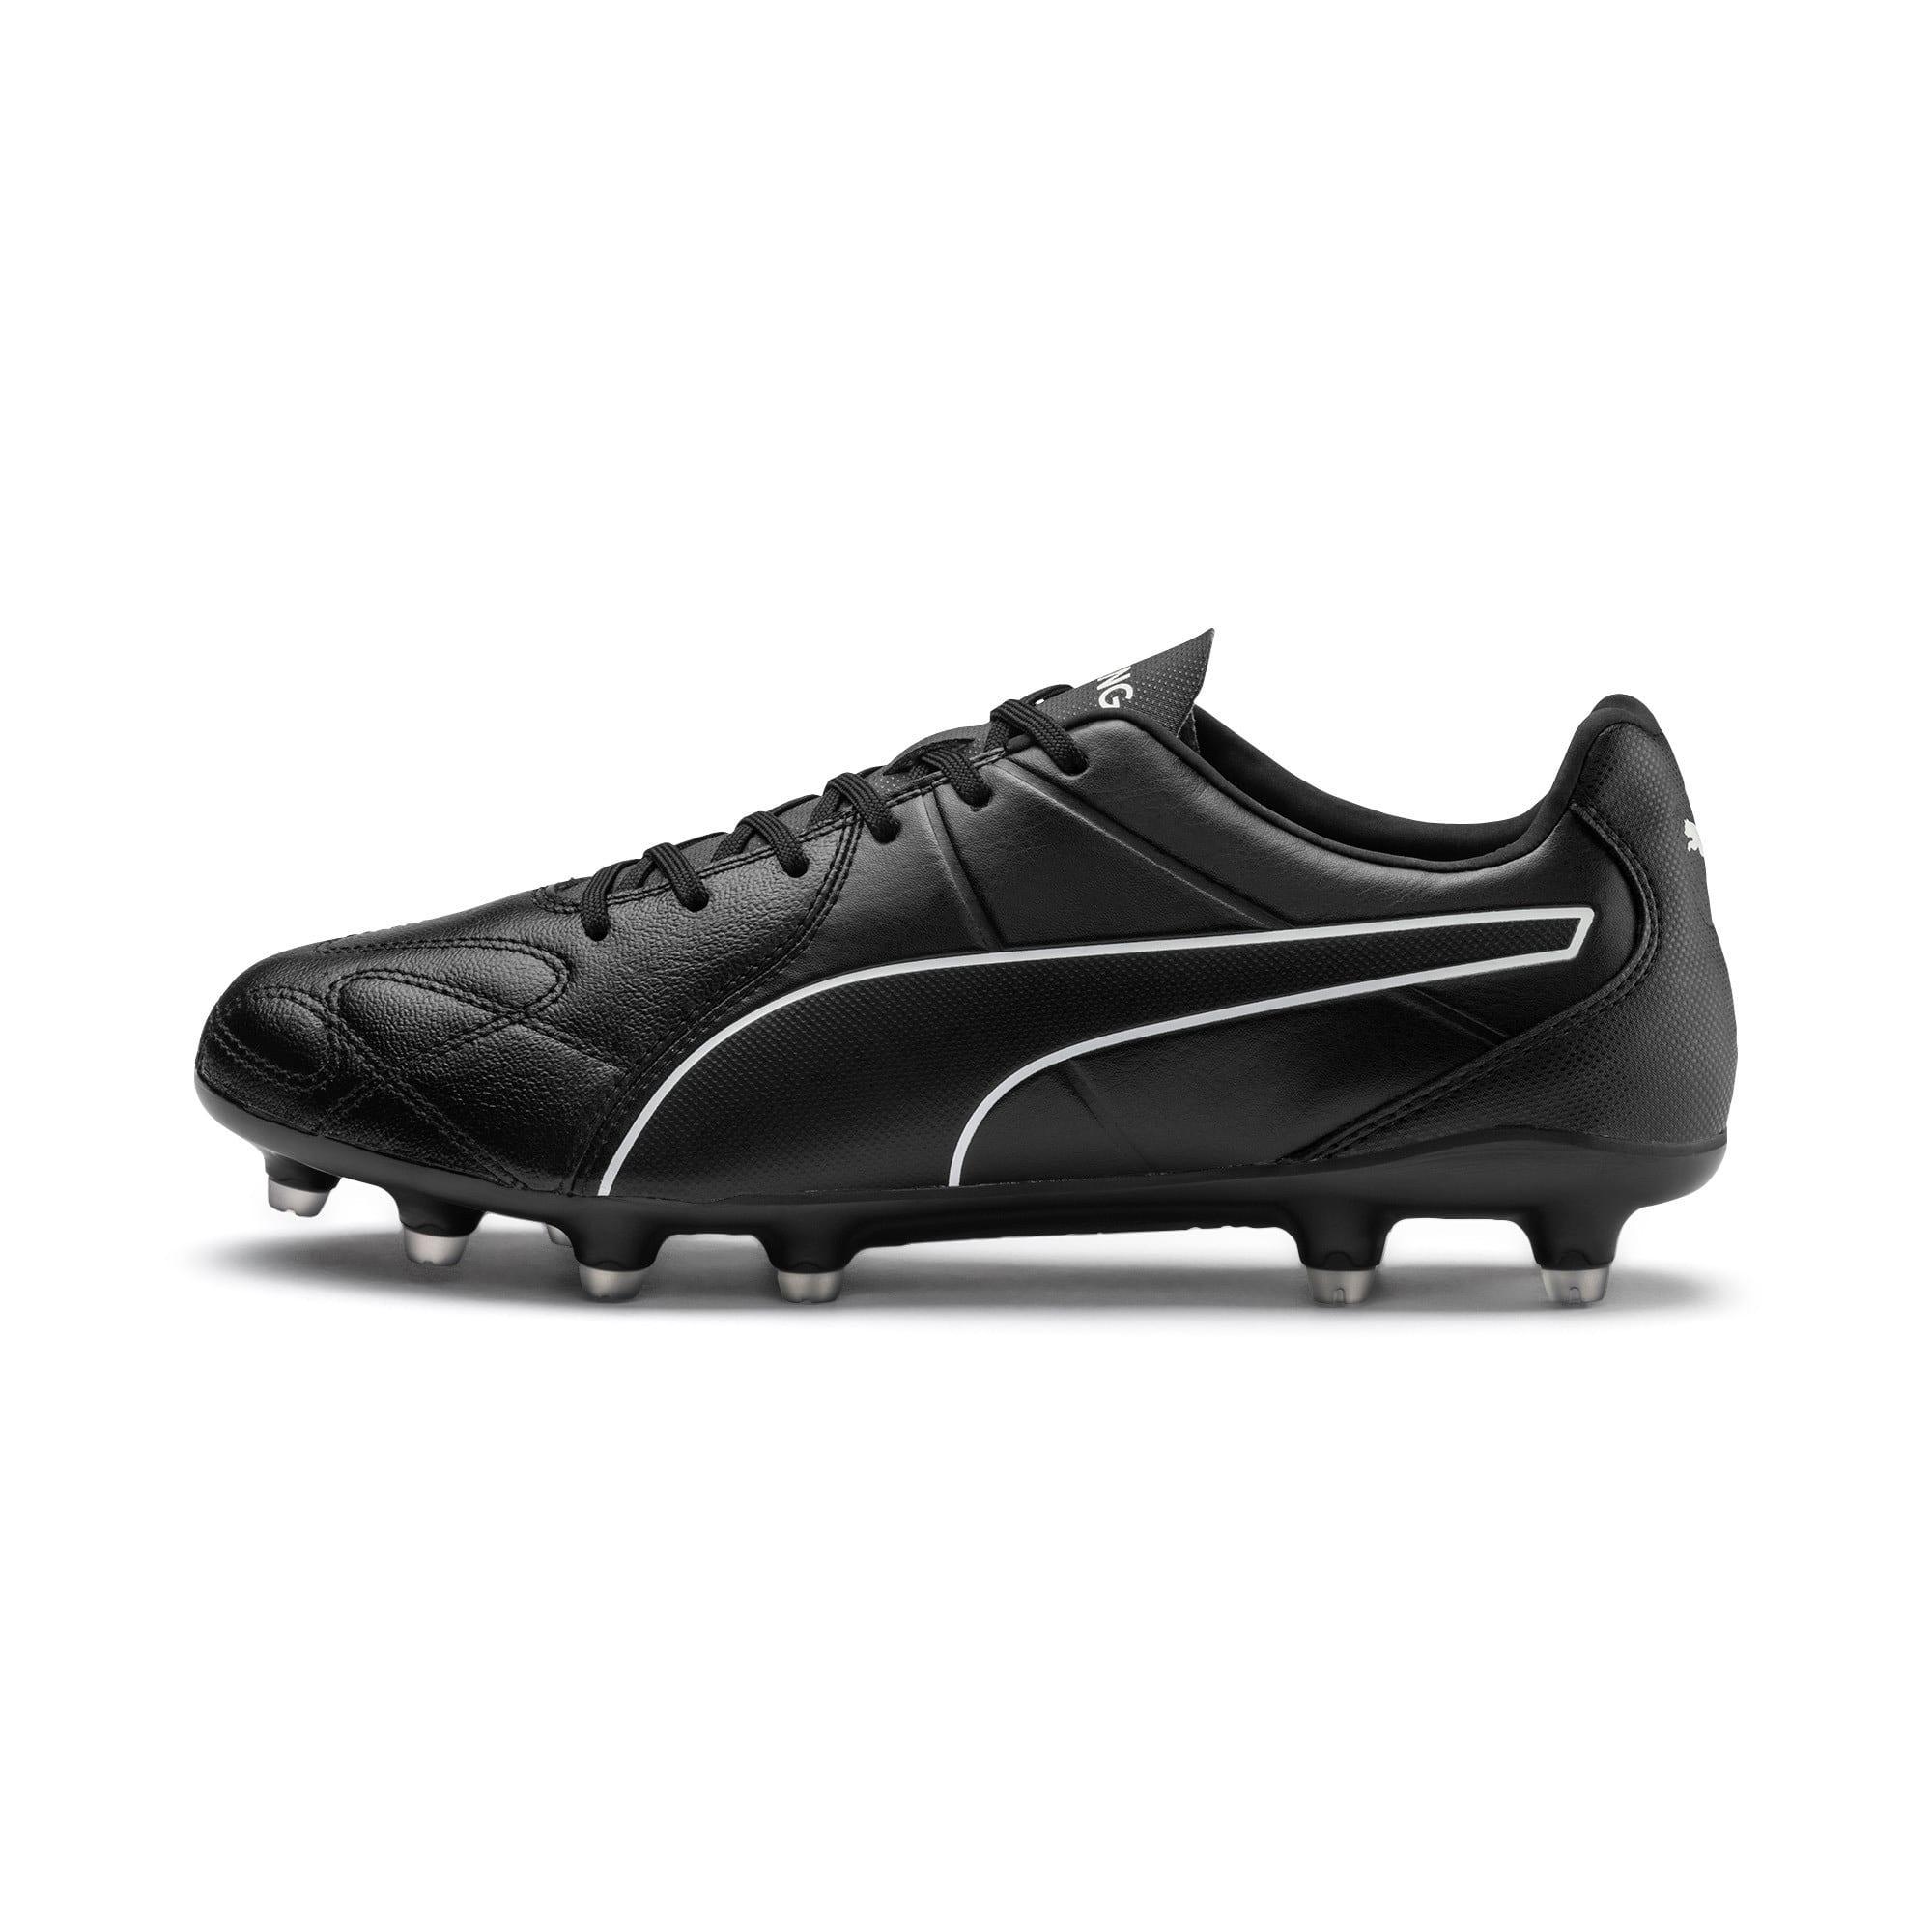 Thumbnail 1 of KING Hero FG Football Boots, Puma Black-Puma White, medium-IND